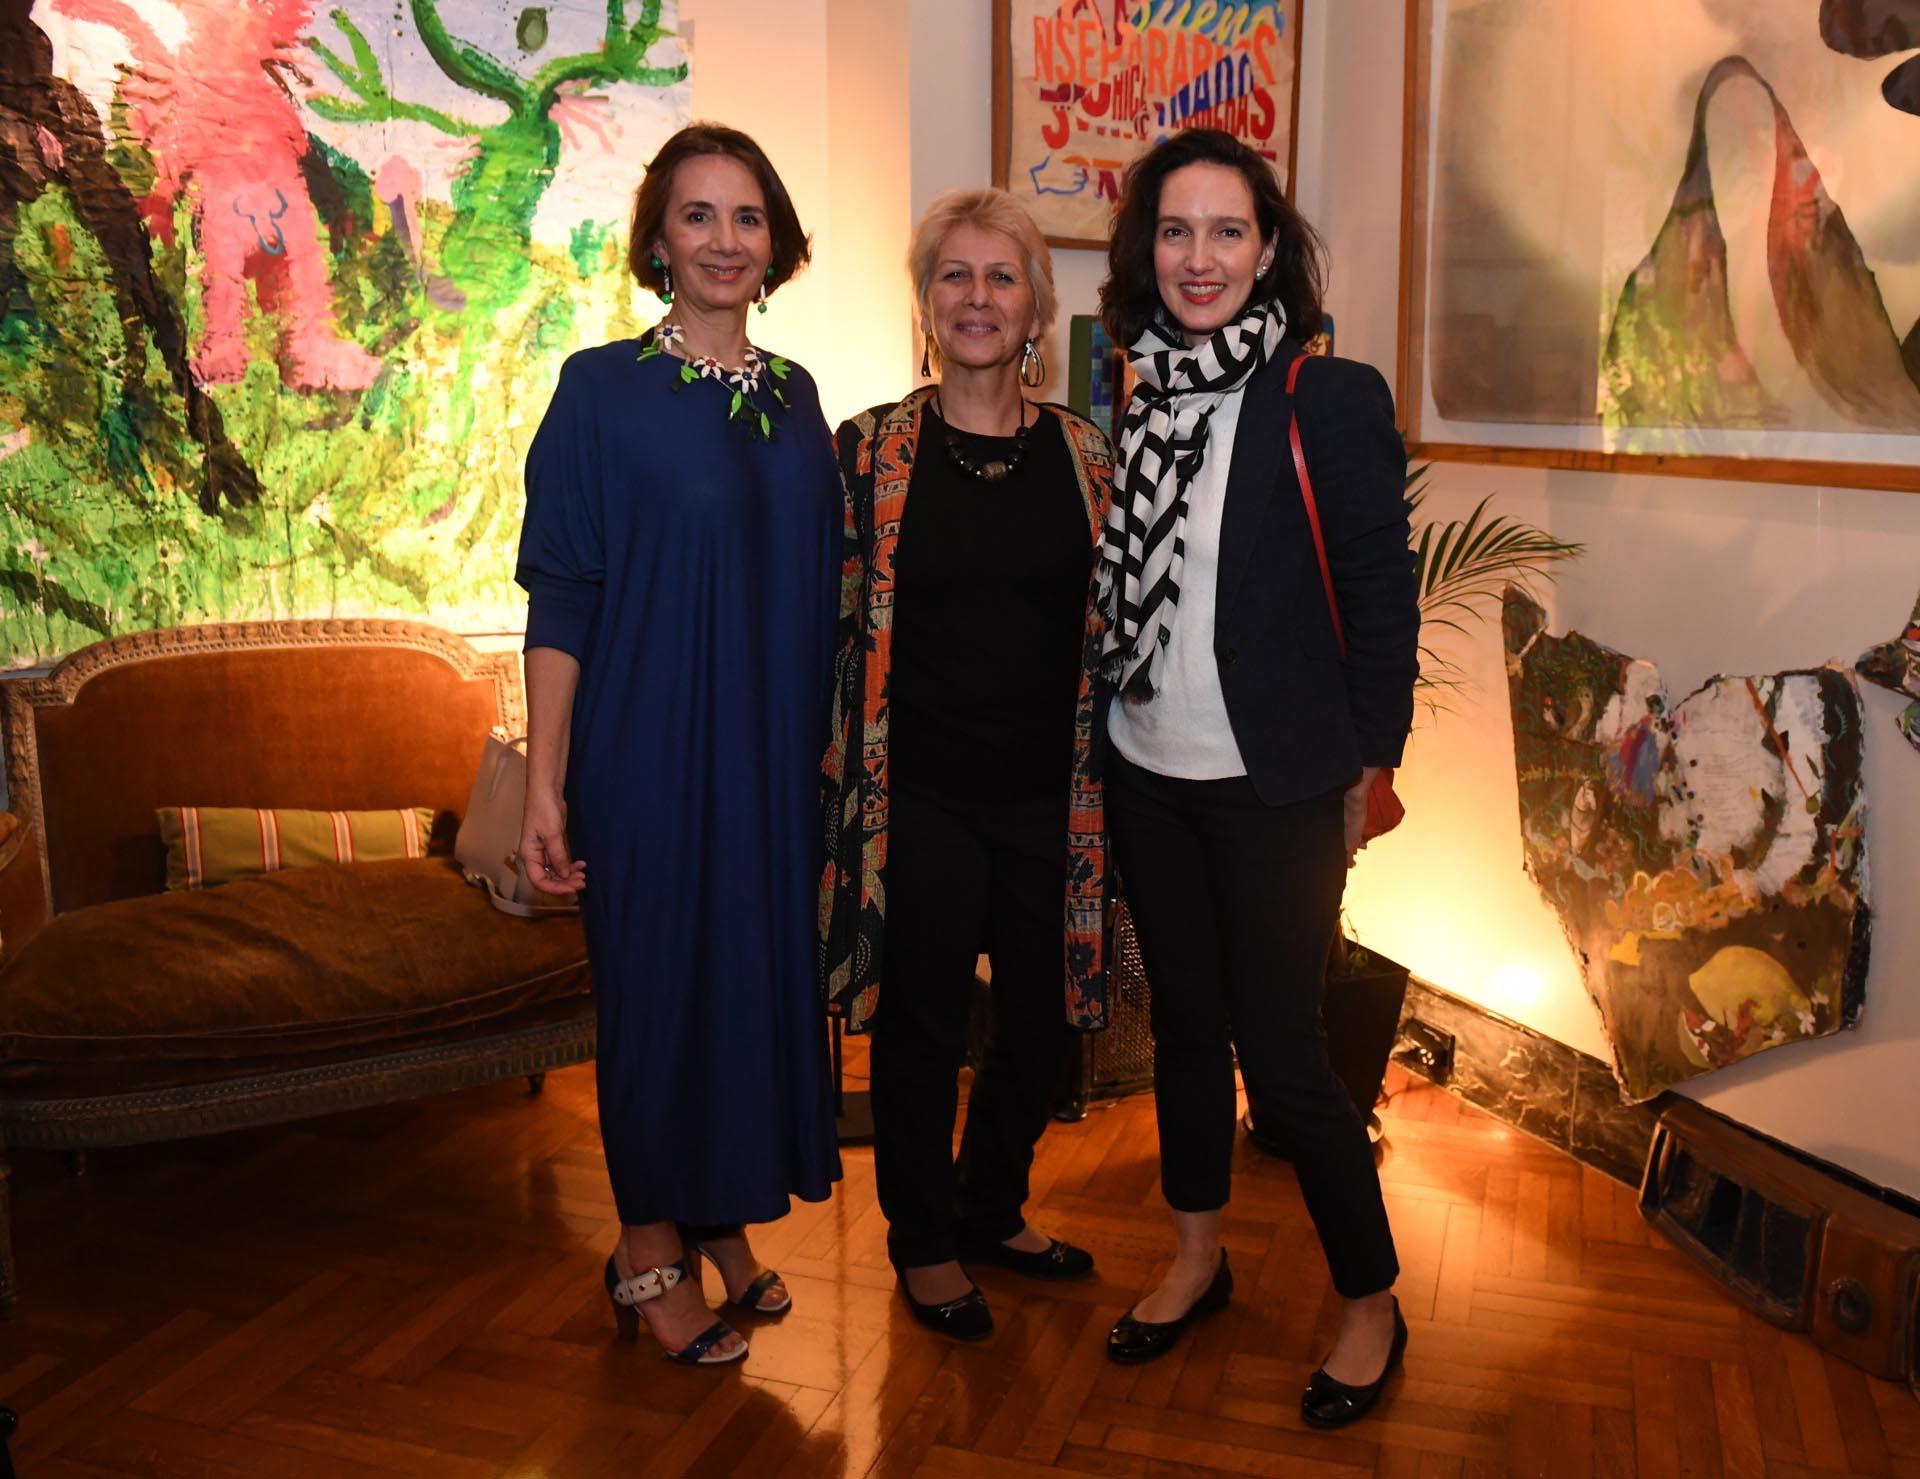 Dominique Biquard junto a Patricia Pellegrino Haas, presidente de Marianne, y Marie Sinizerguez, vicepresidente